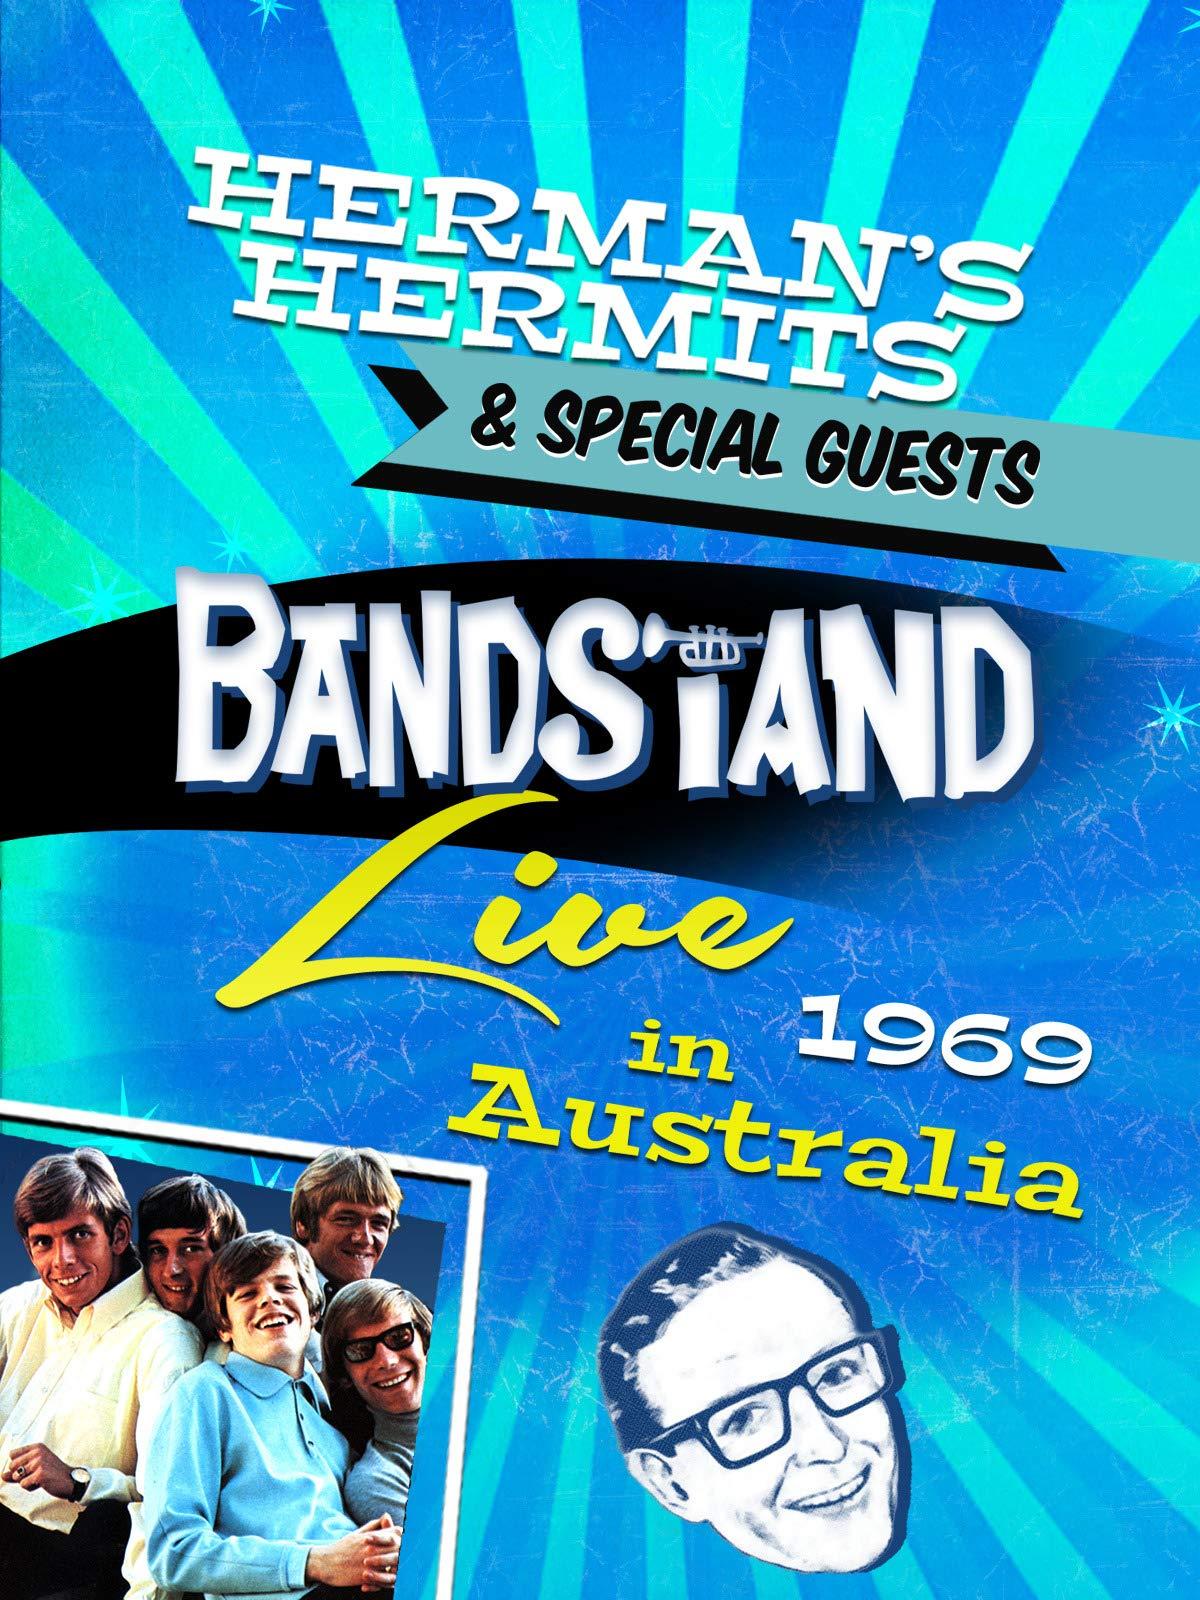 Bandstand Live in Australia: Herman's Hermits